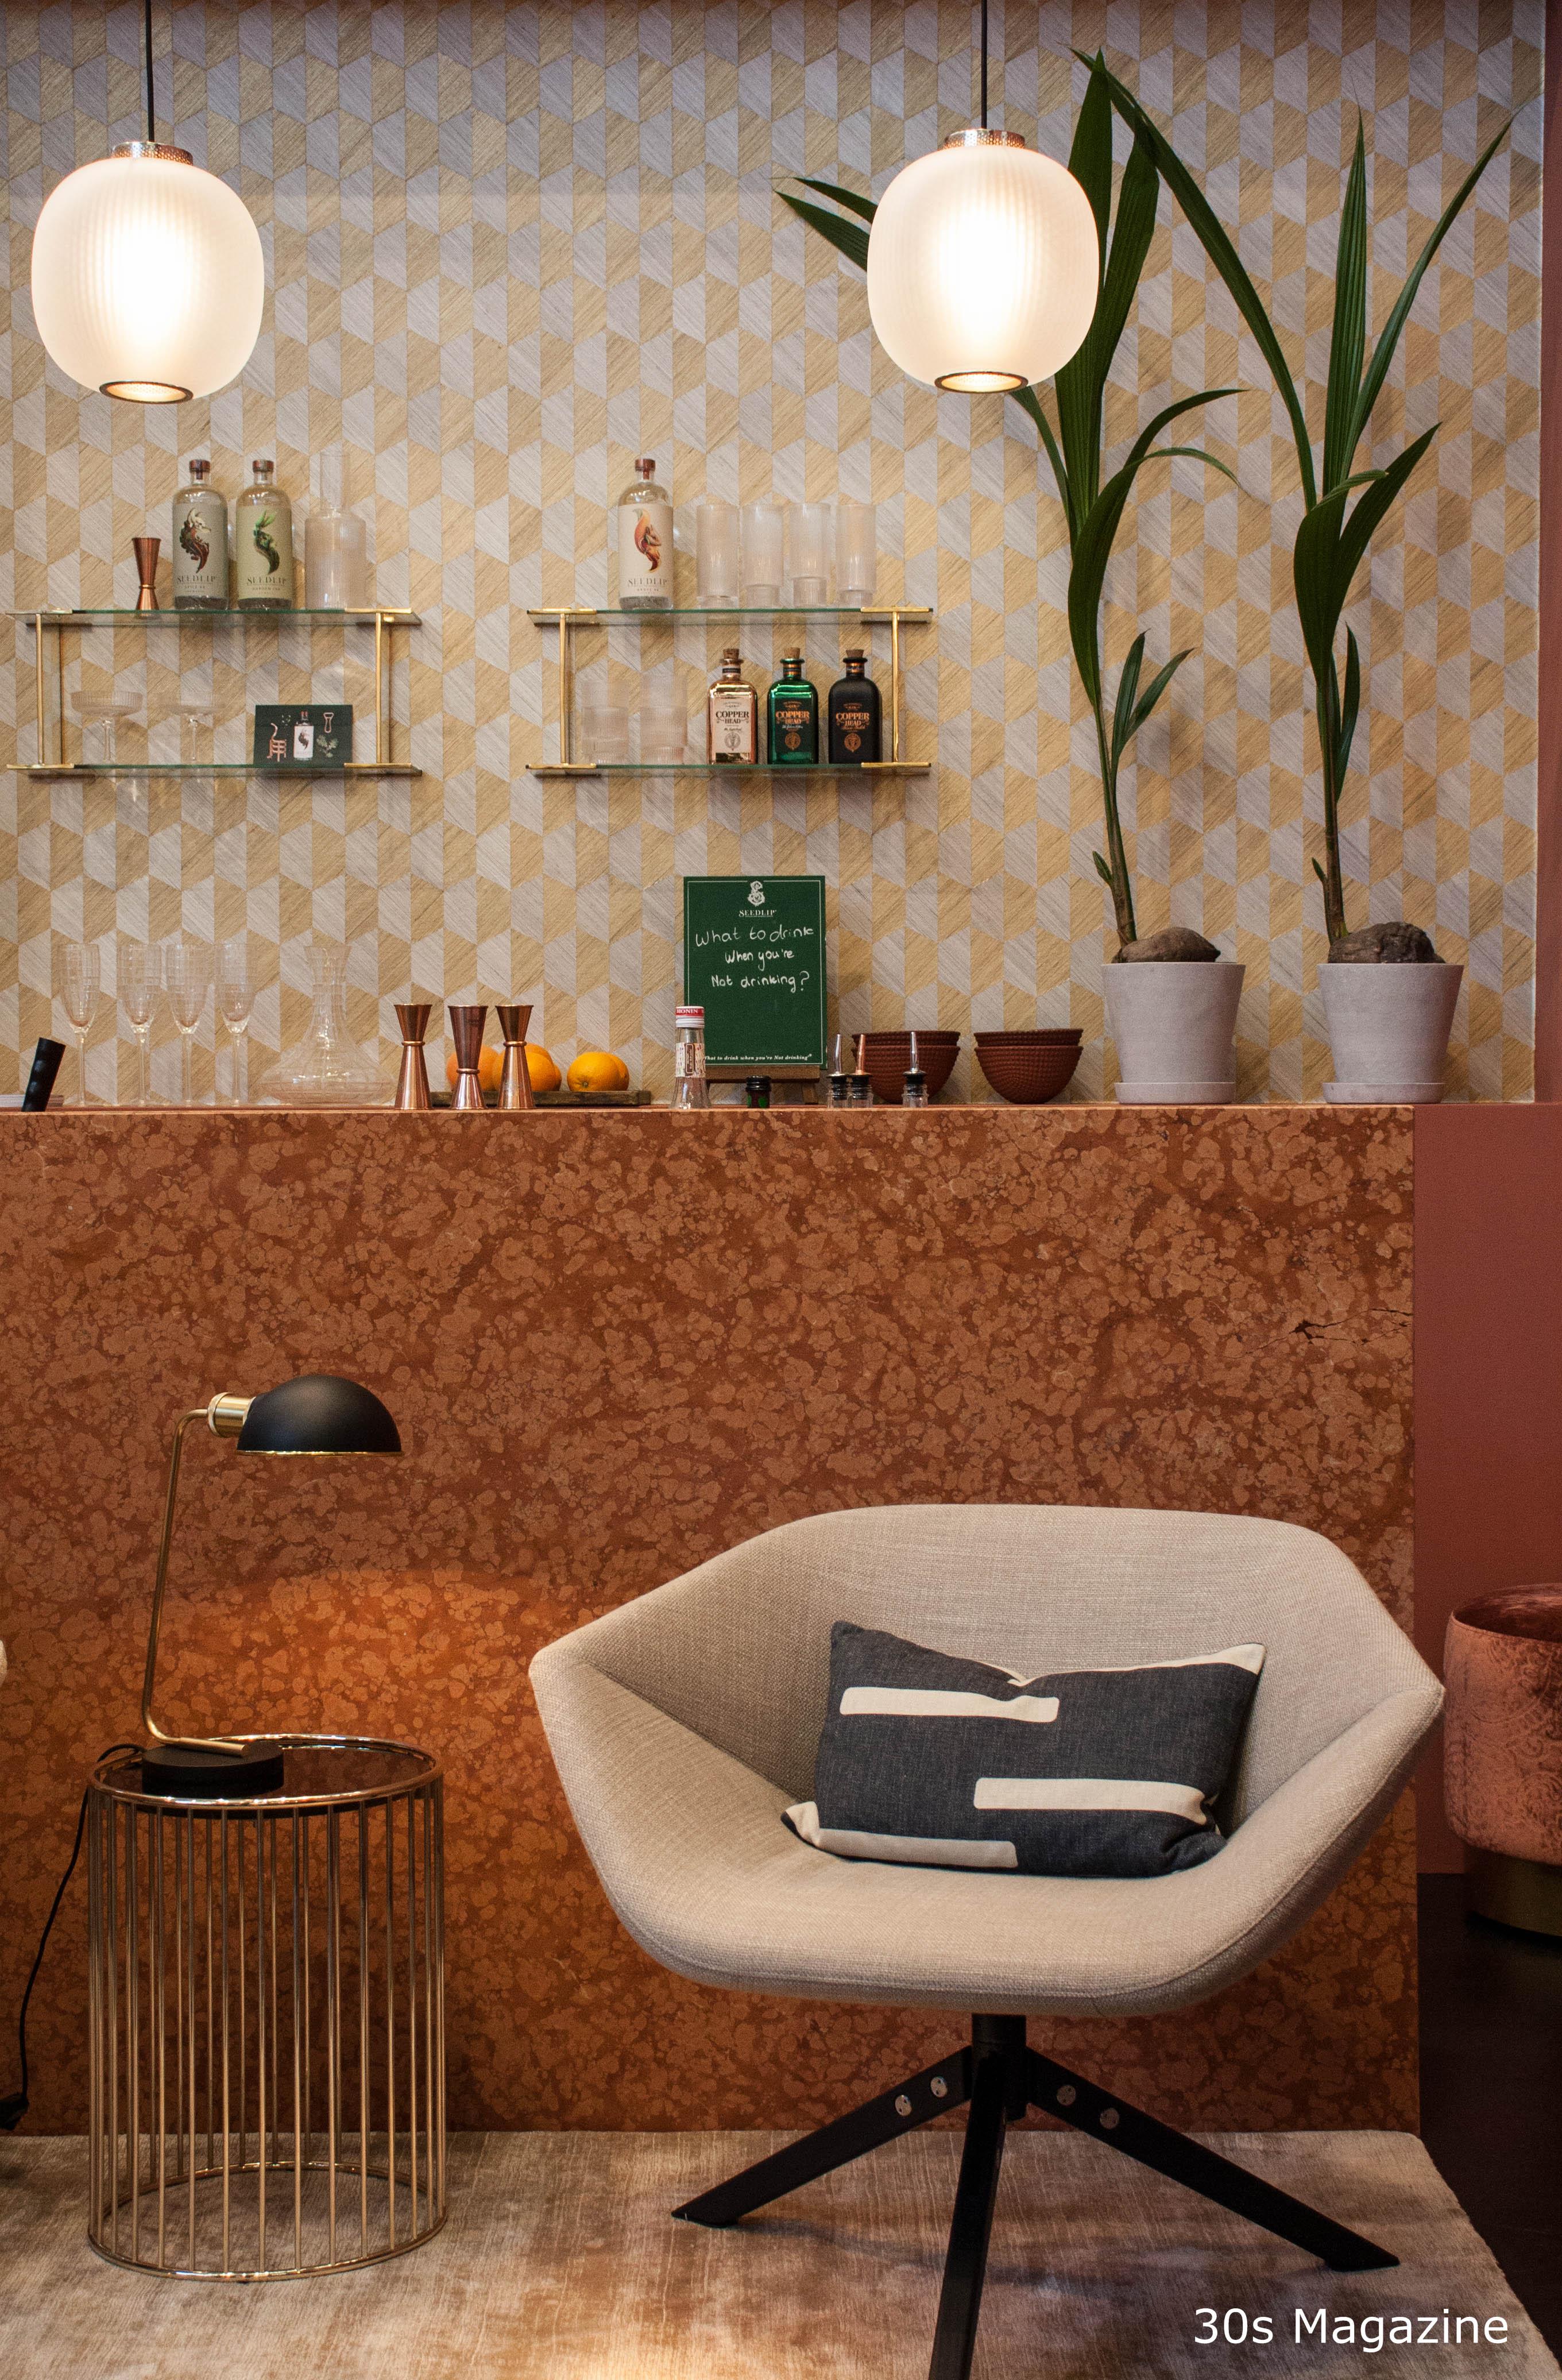 30s Magazine - Stylish Living inspiration at the Amsterdam interior ...